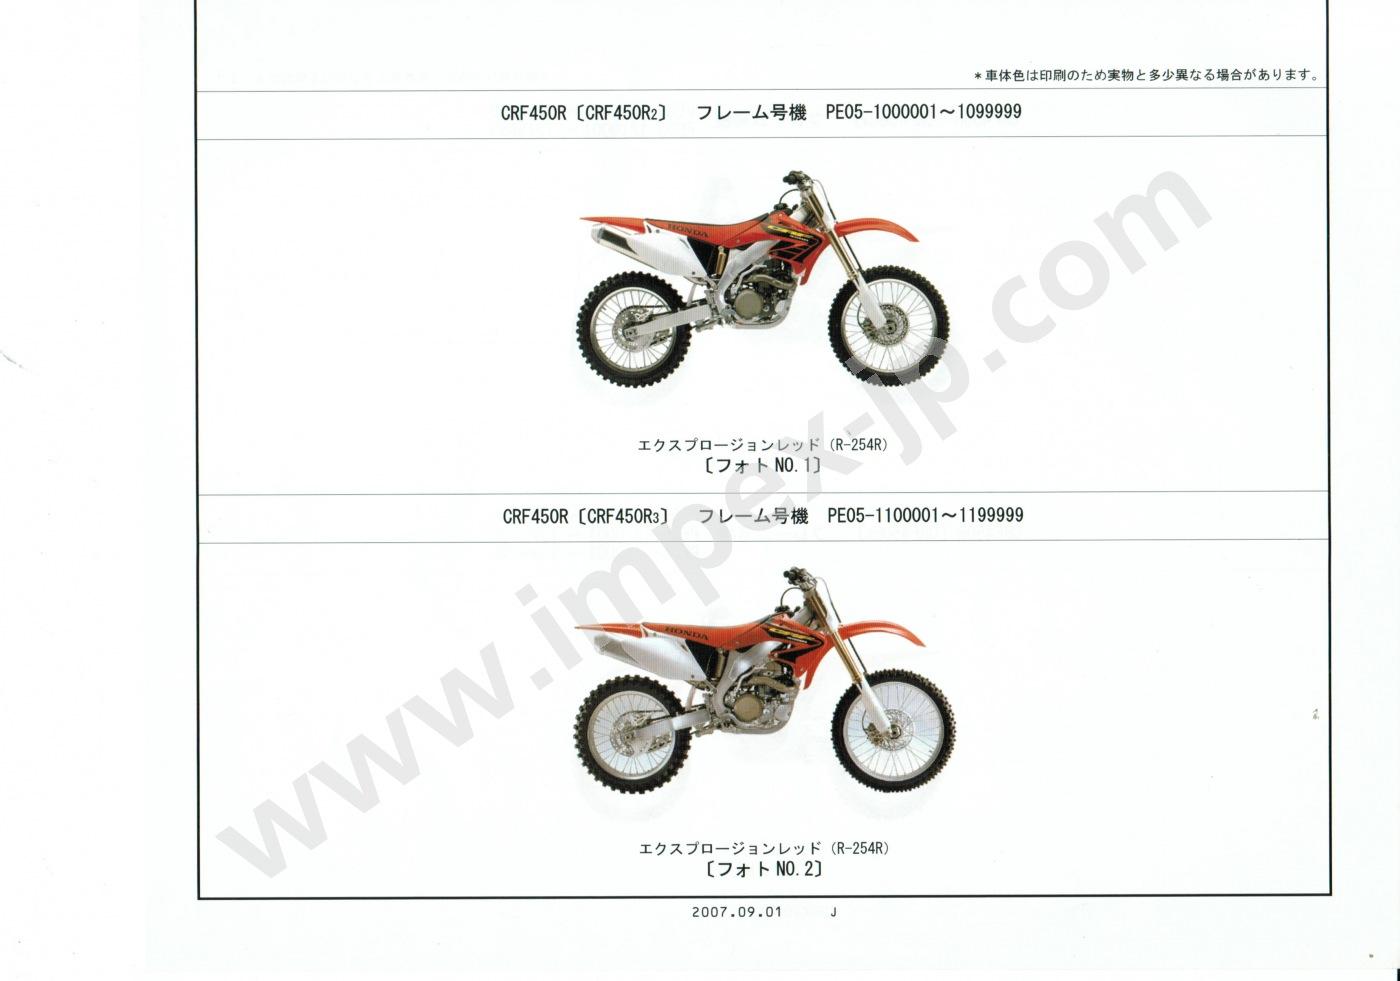 Motorcycle parts HONDA CRF450R PE05-100, 110, 120, 121, 130